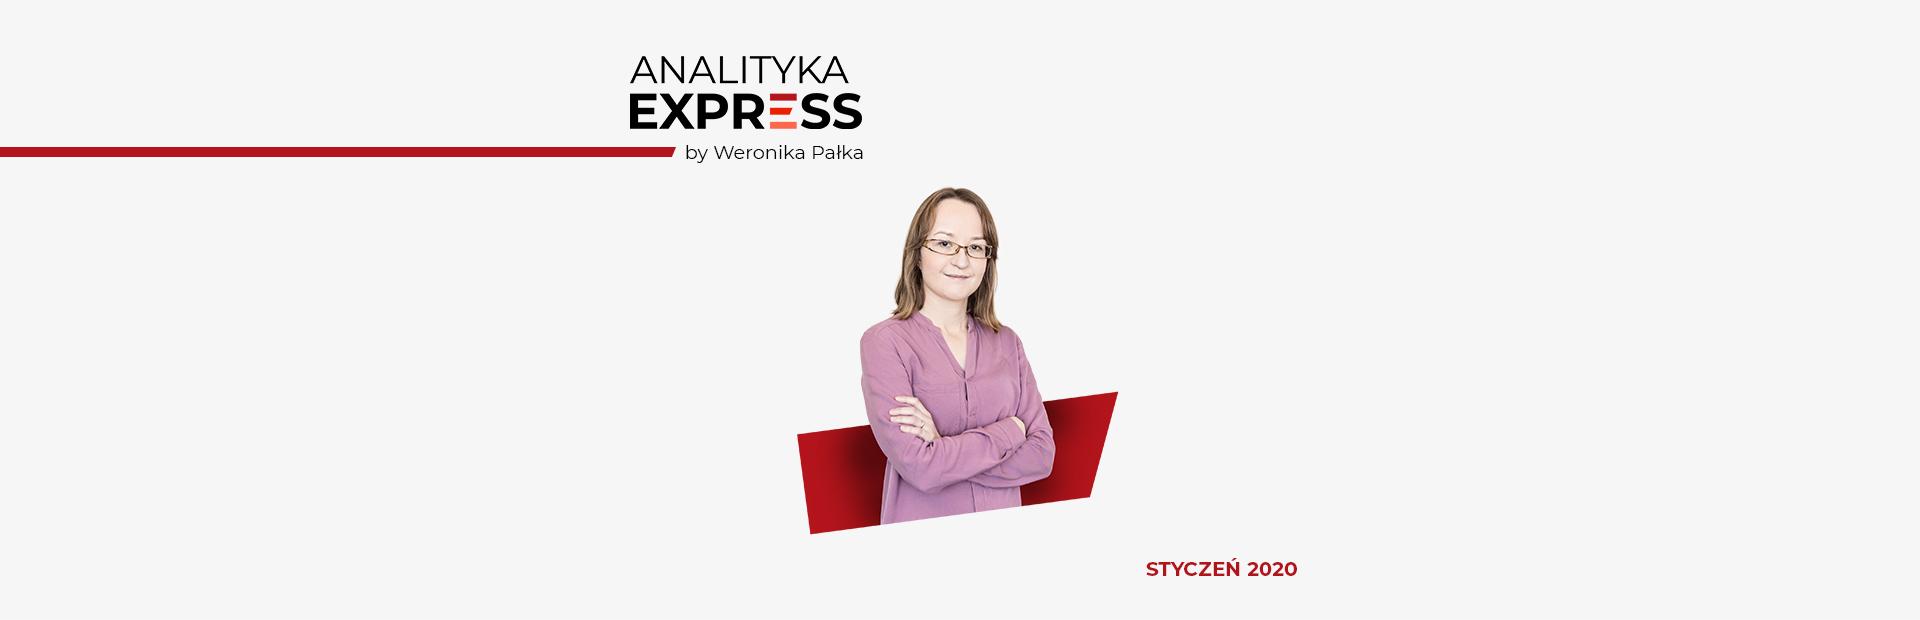 Analityka Express 1/2020